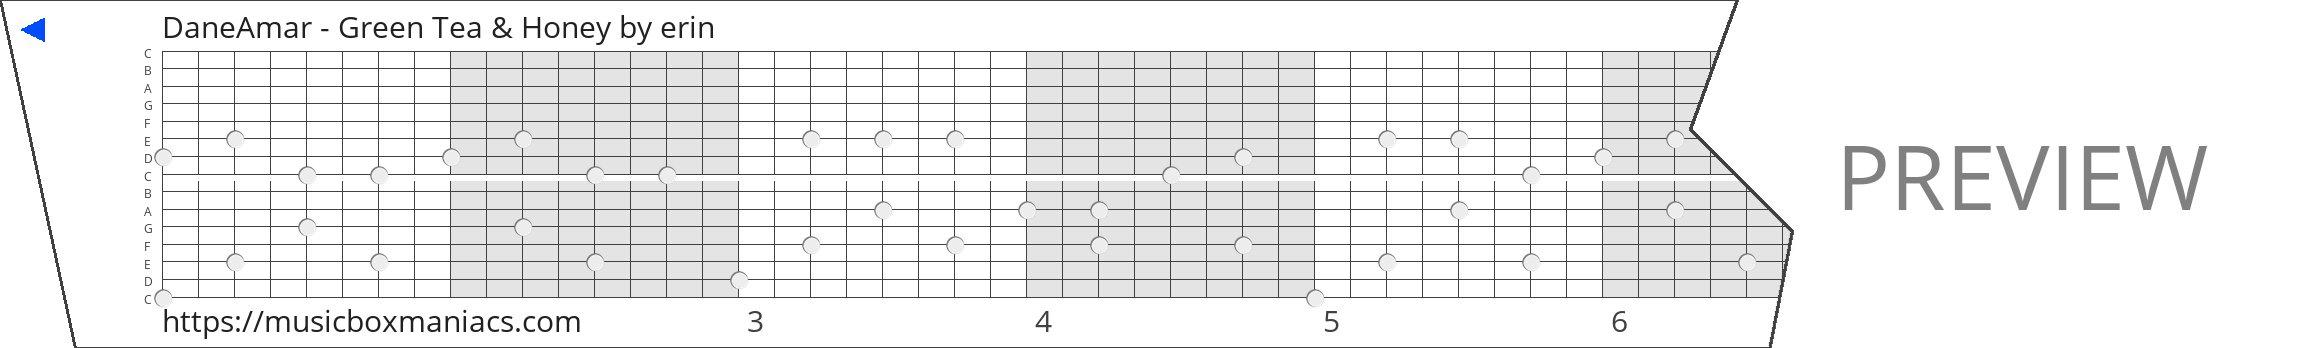 DaneAmar - Green Tea & Honey 15 note music box paper strip